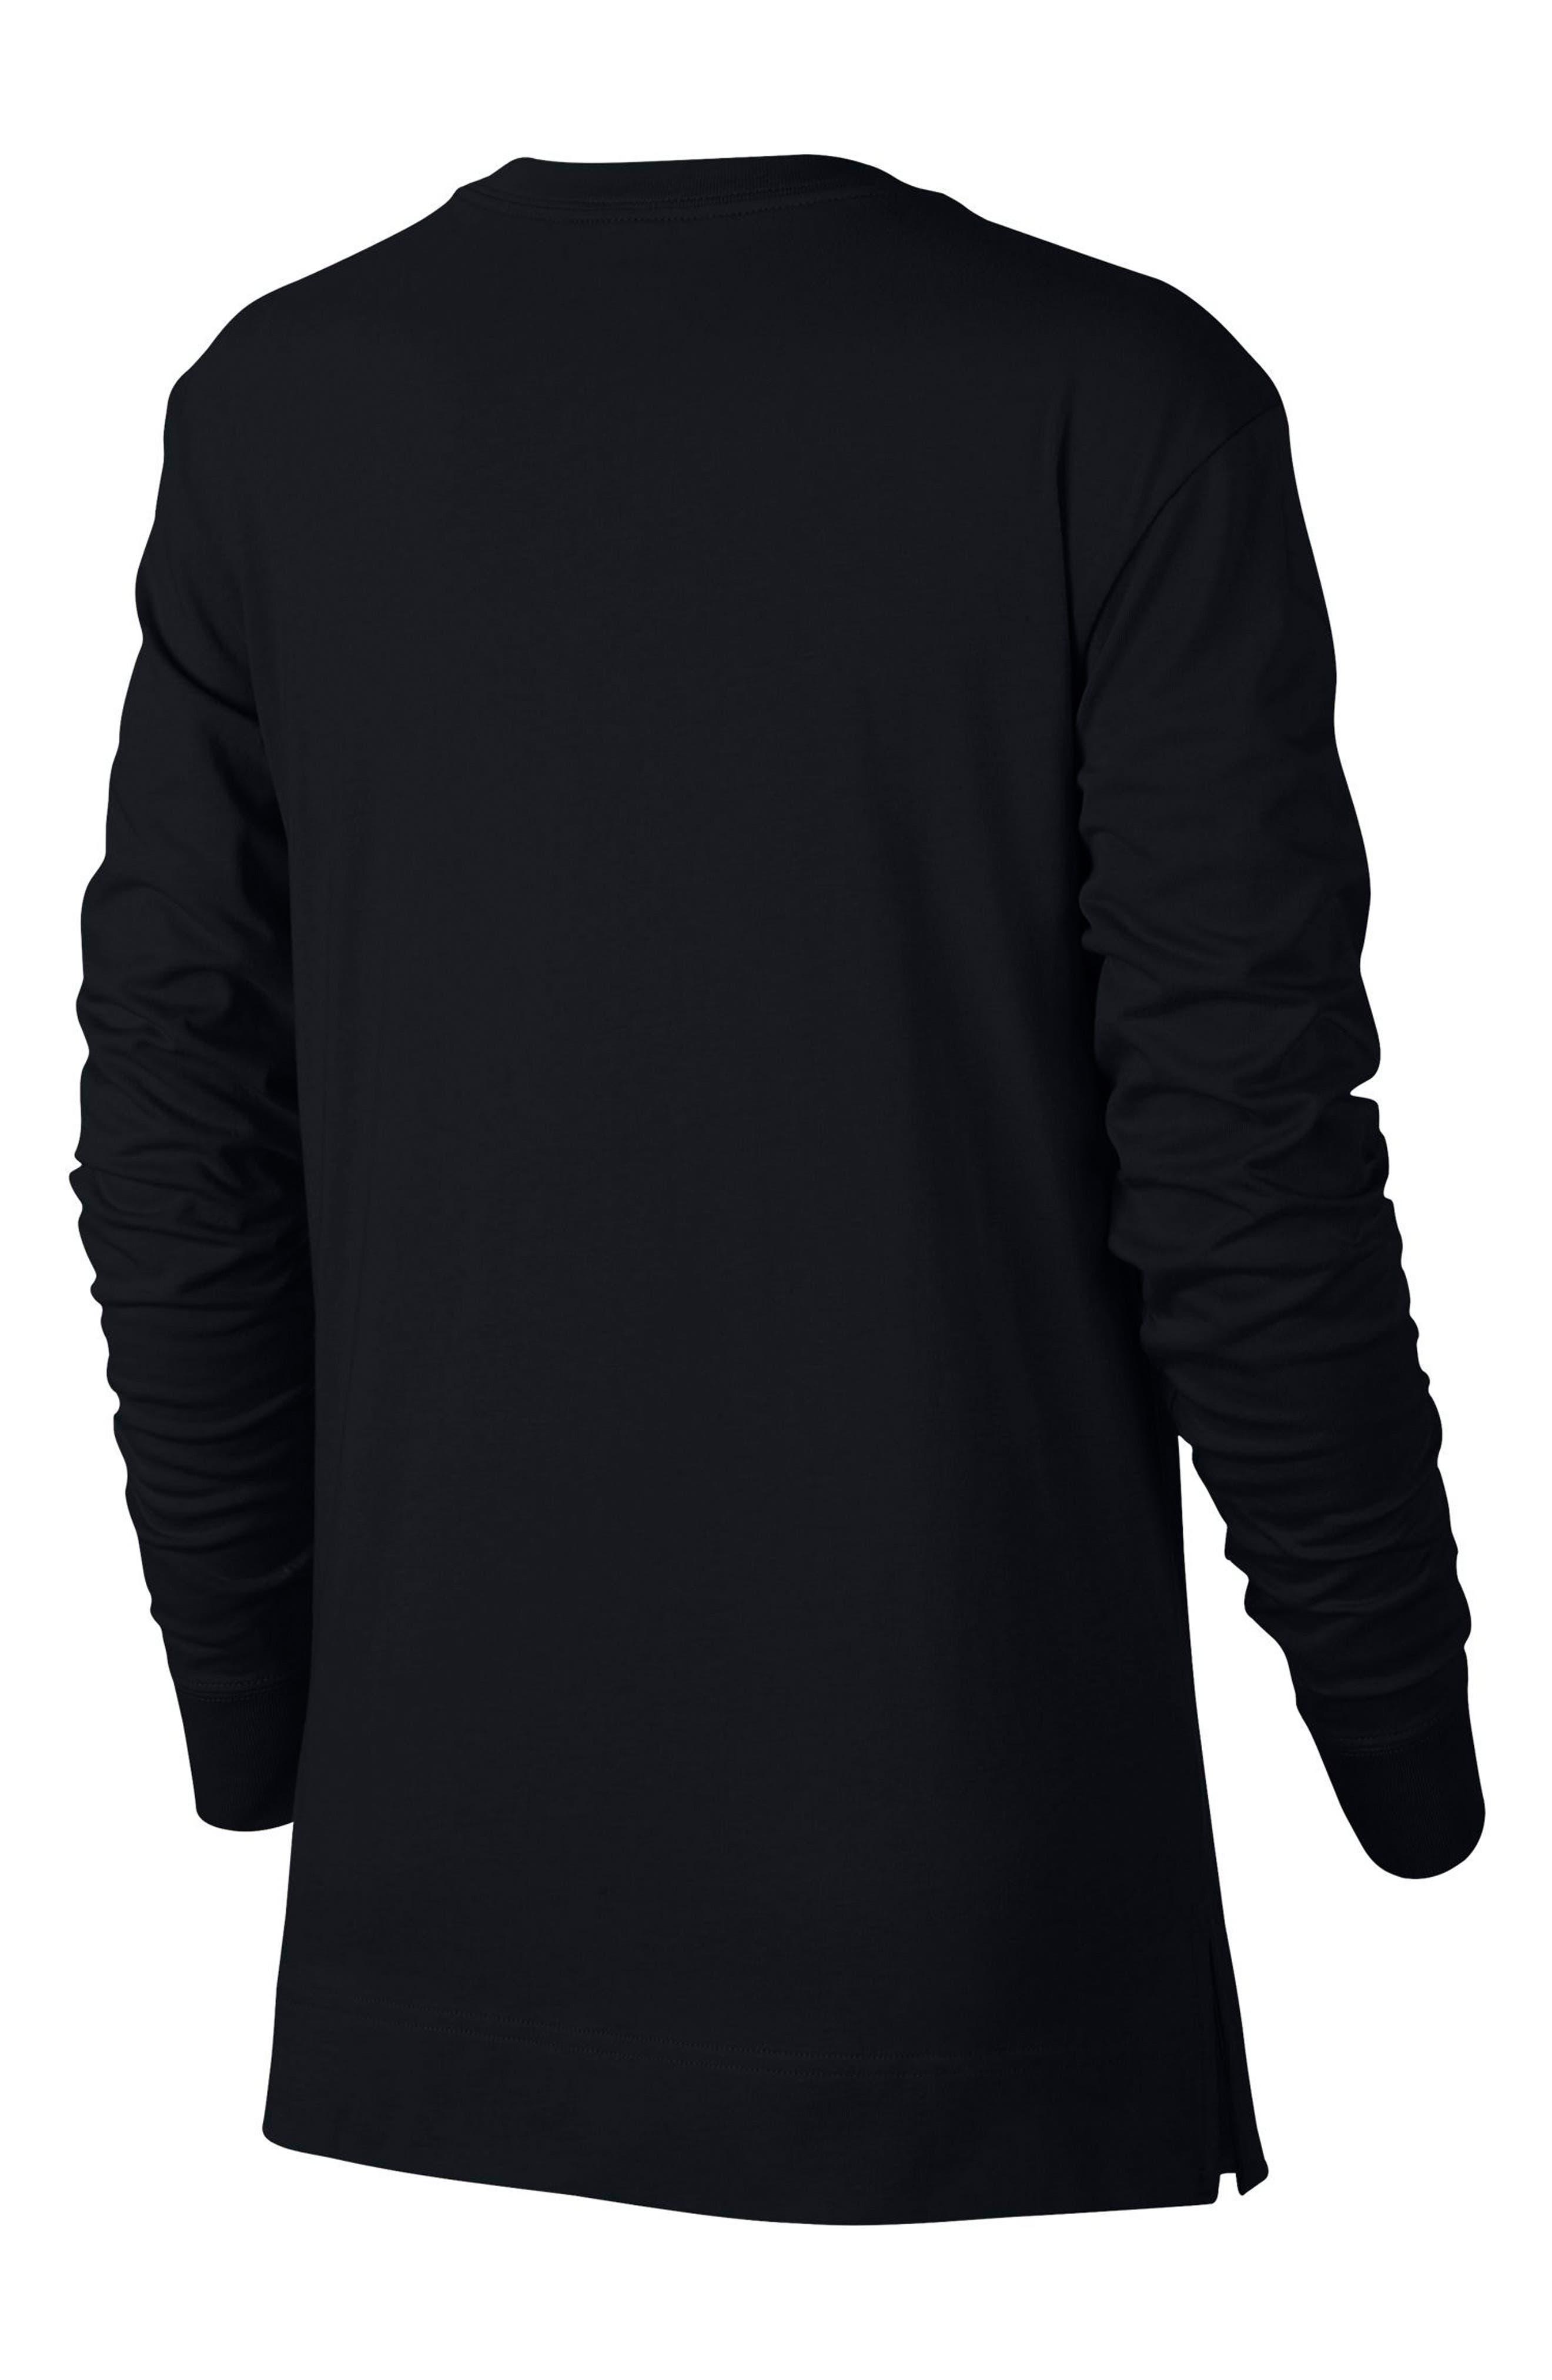 Sportswear HBR Women's Long Sleeve Tee,                             Alternate thumbnail 2, color,                             010